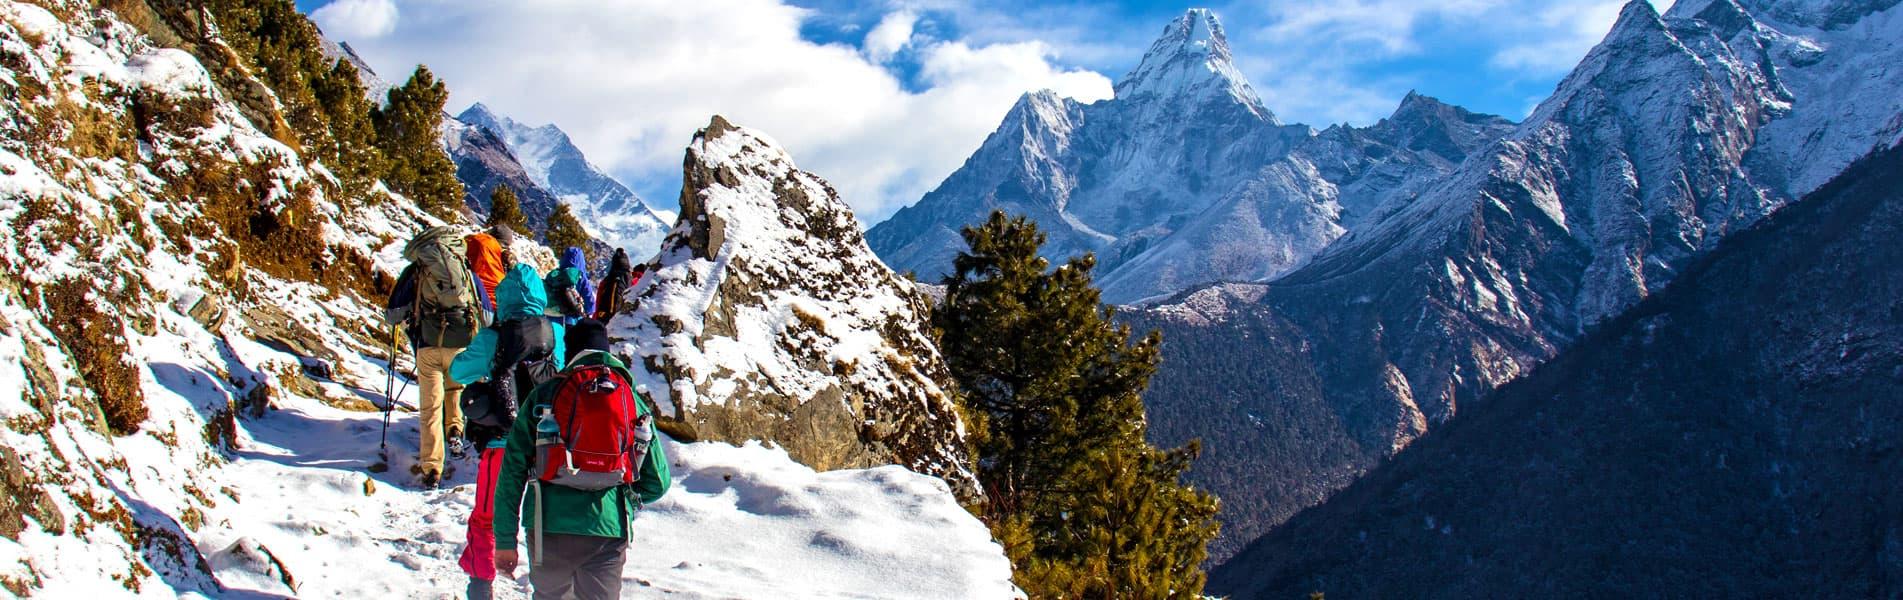 Himalayas Hiking in Nepal